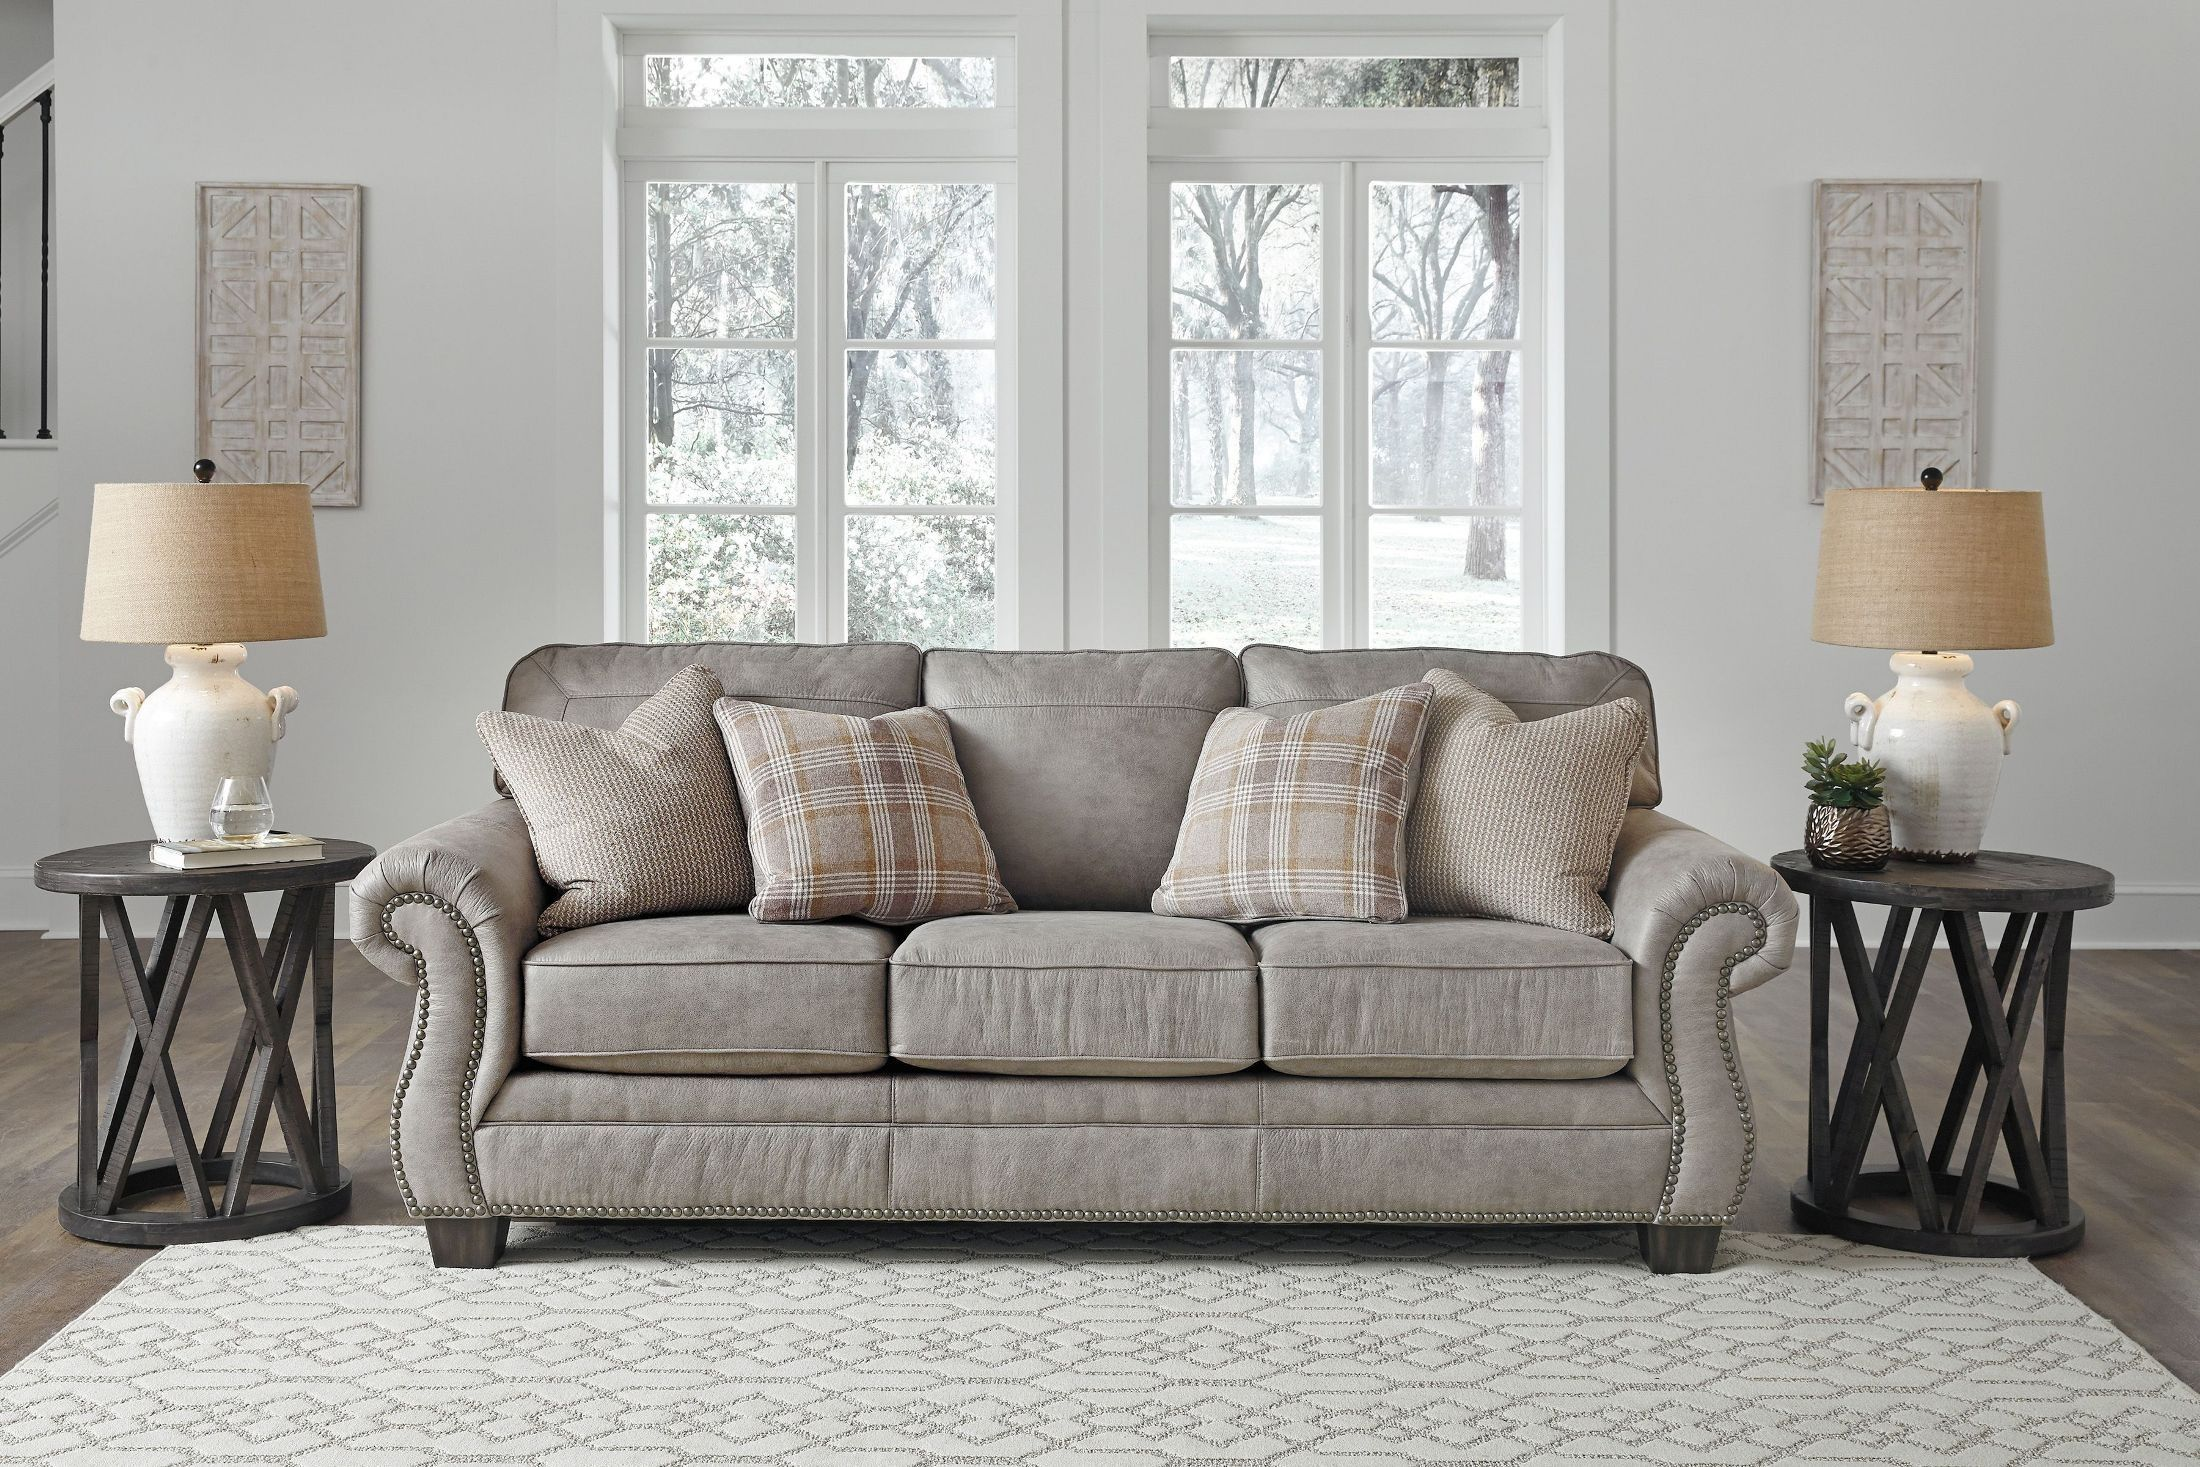 10+ Top Olsberg Steel Living Room Set